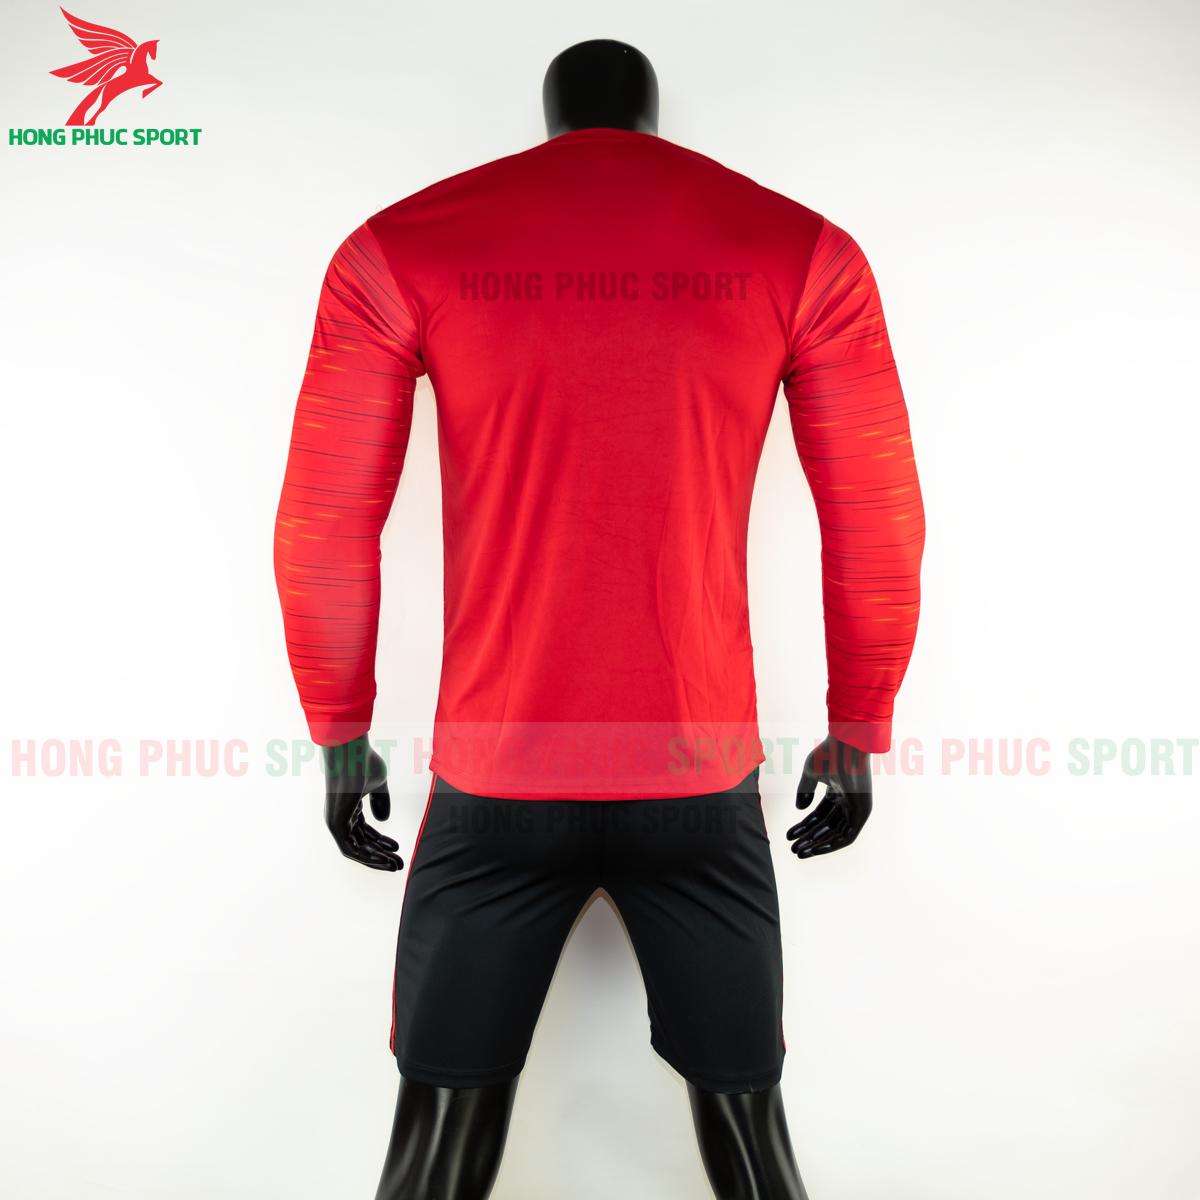 https://cdn.hongphucsport.com/unsafe/s4.shopbay.vn/files/285/ao-dai-tay-manchester-united-2020-san-nha-6-5f8fdd408ff65.png